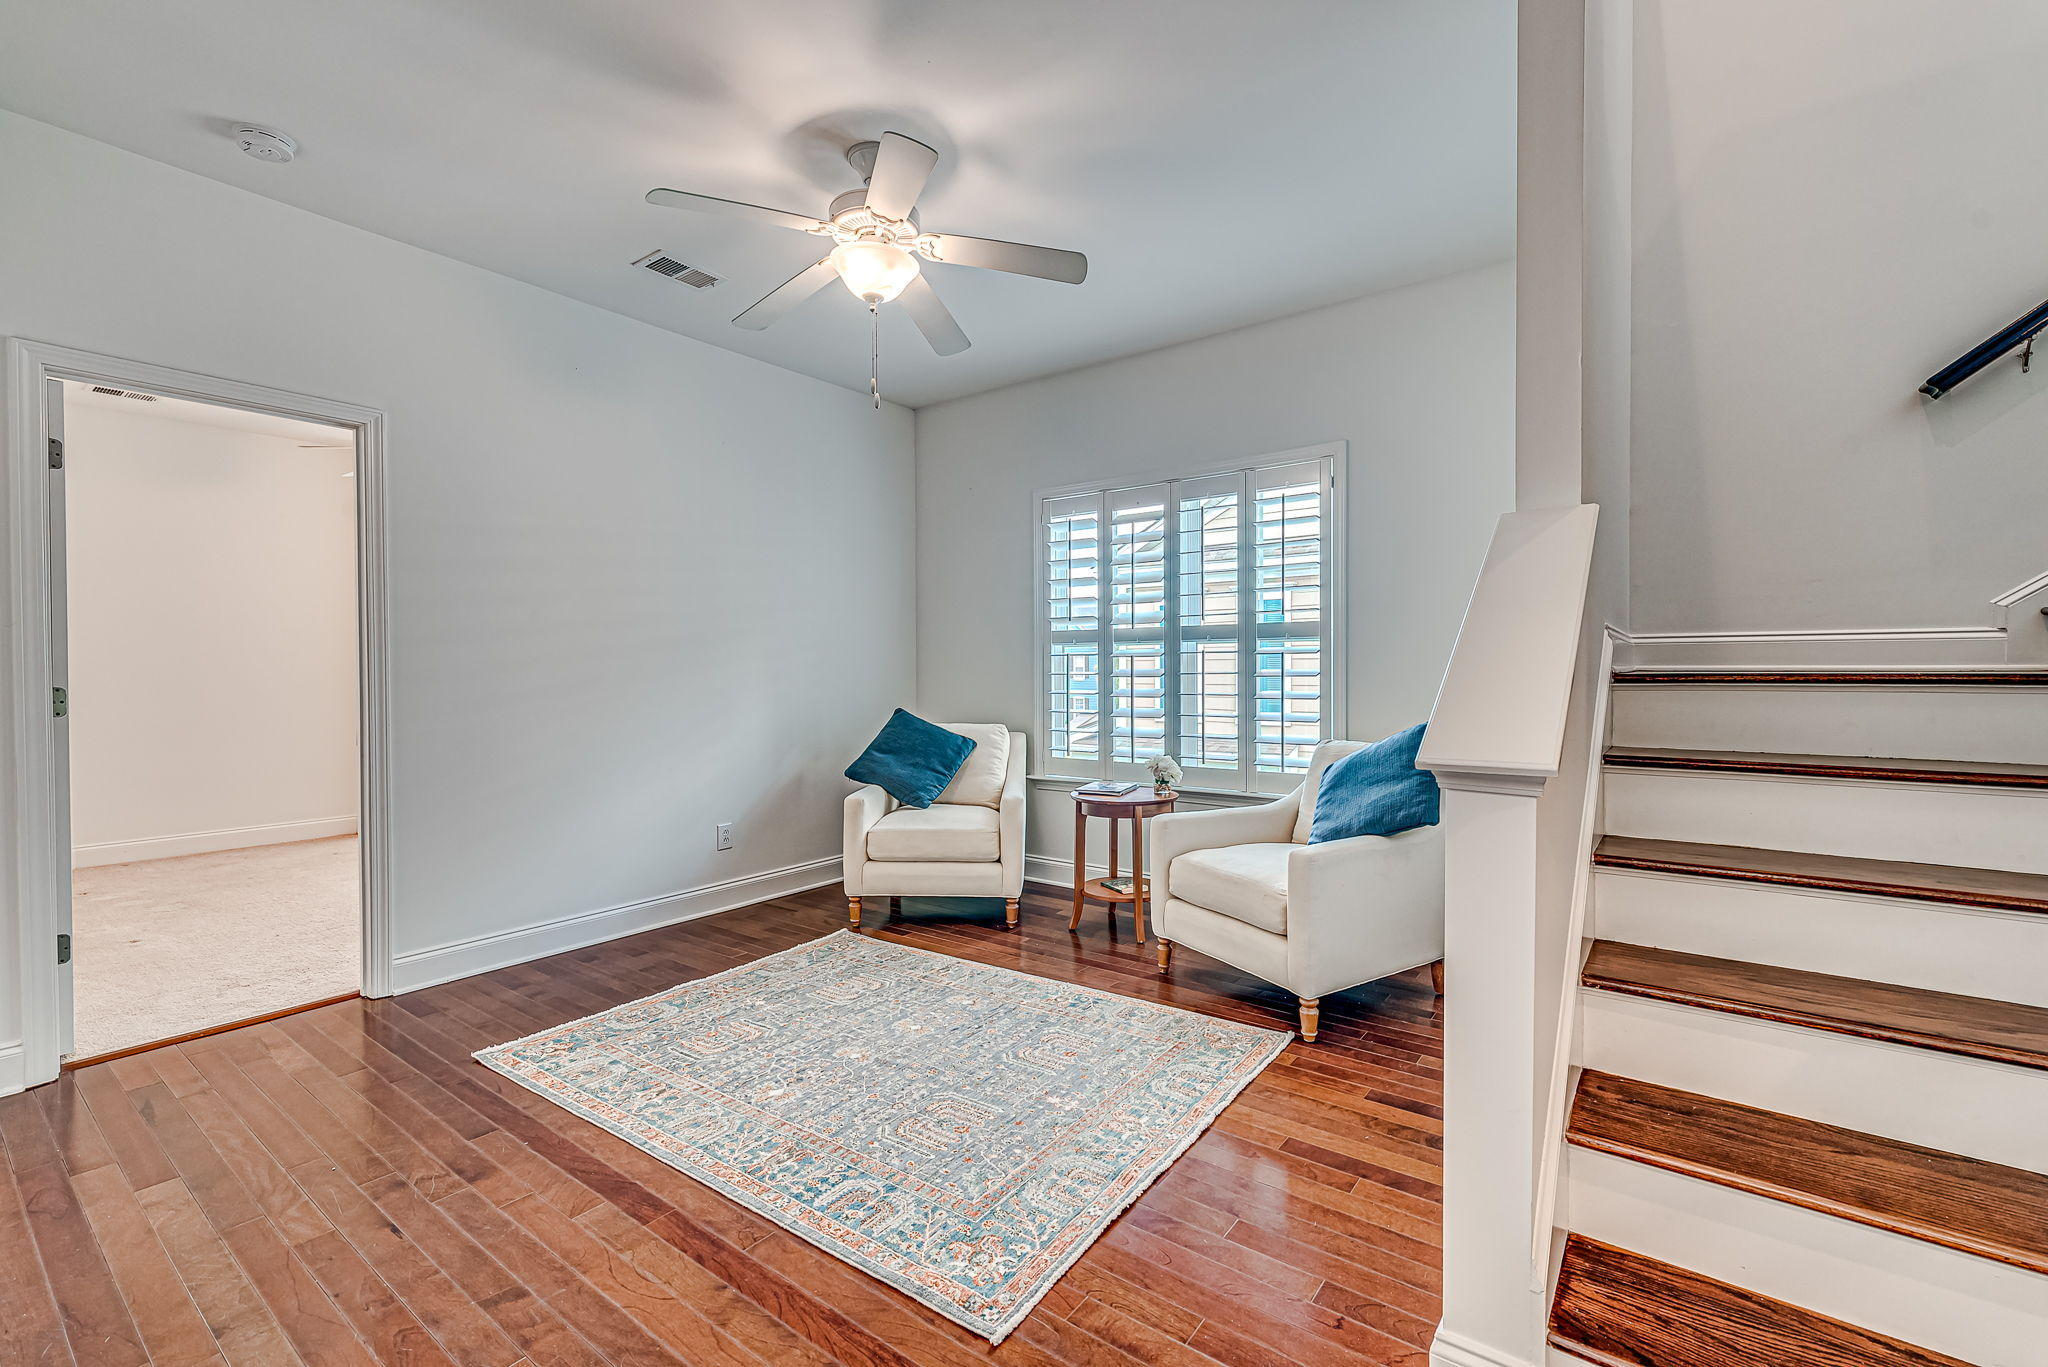 Dunes West Homes For Sale - 2476 Kings Gate, Mount Pleasant, SC - 33